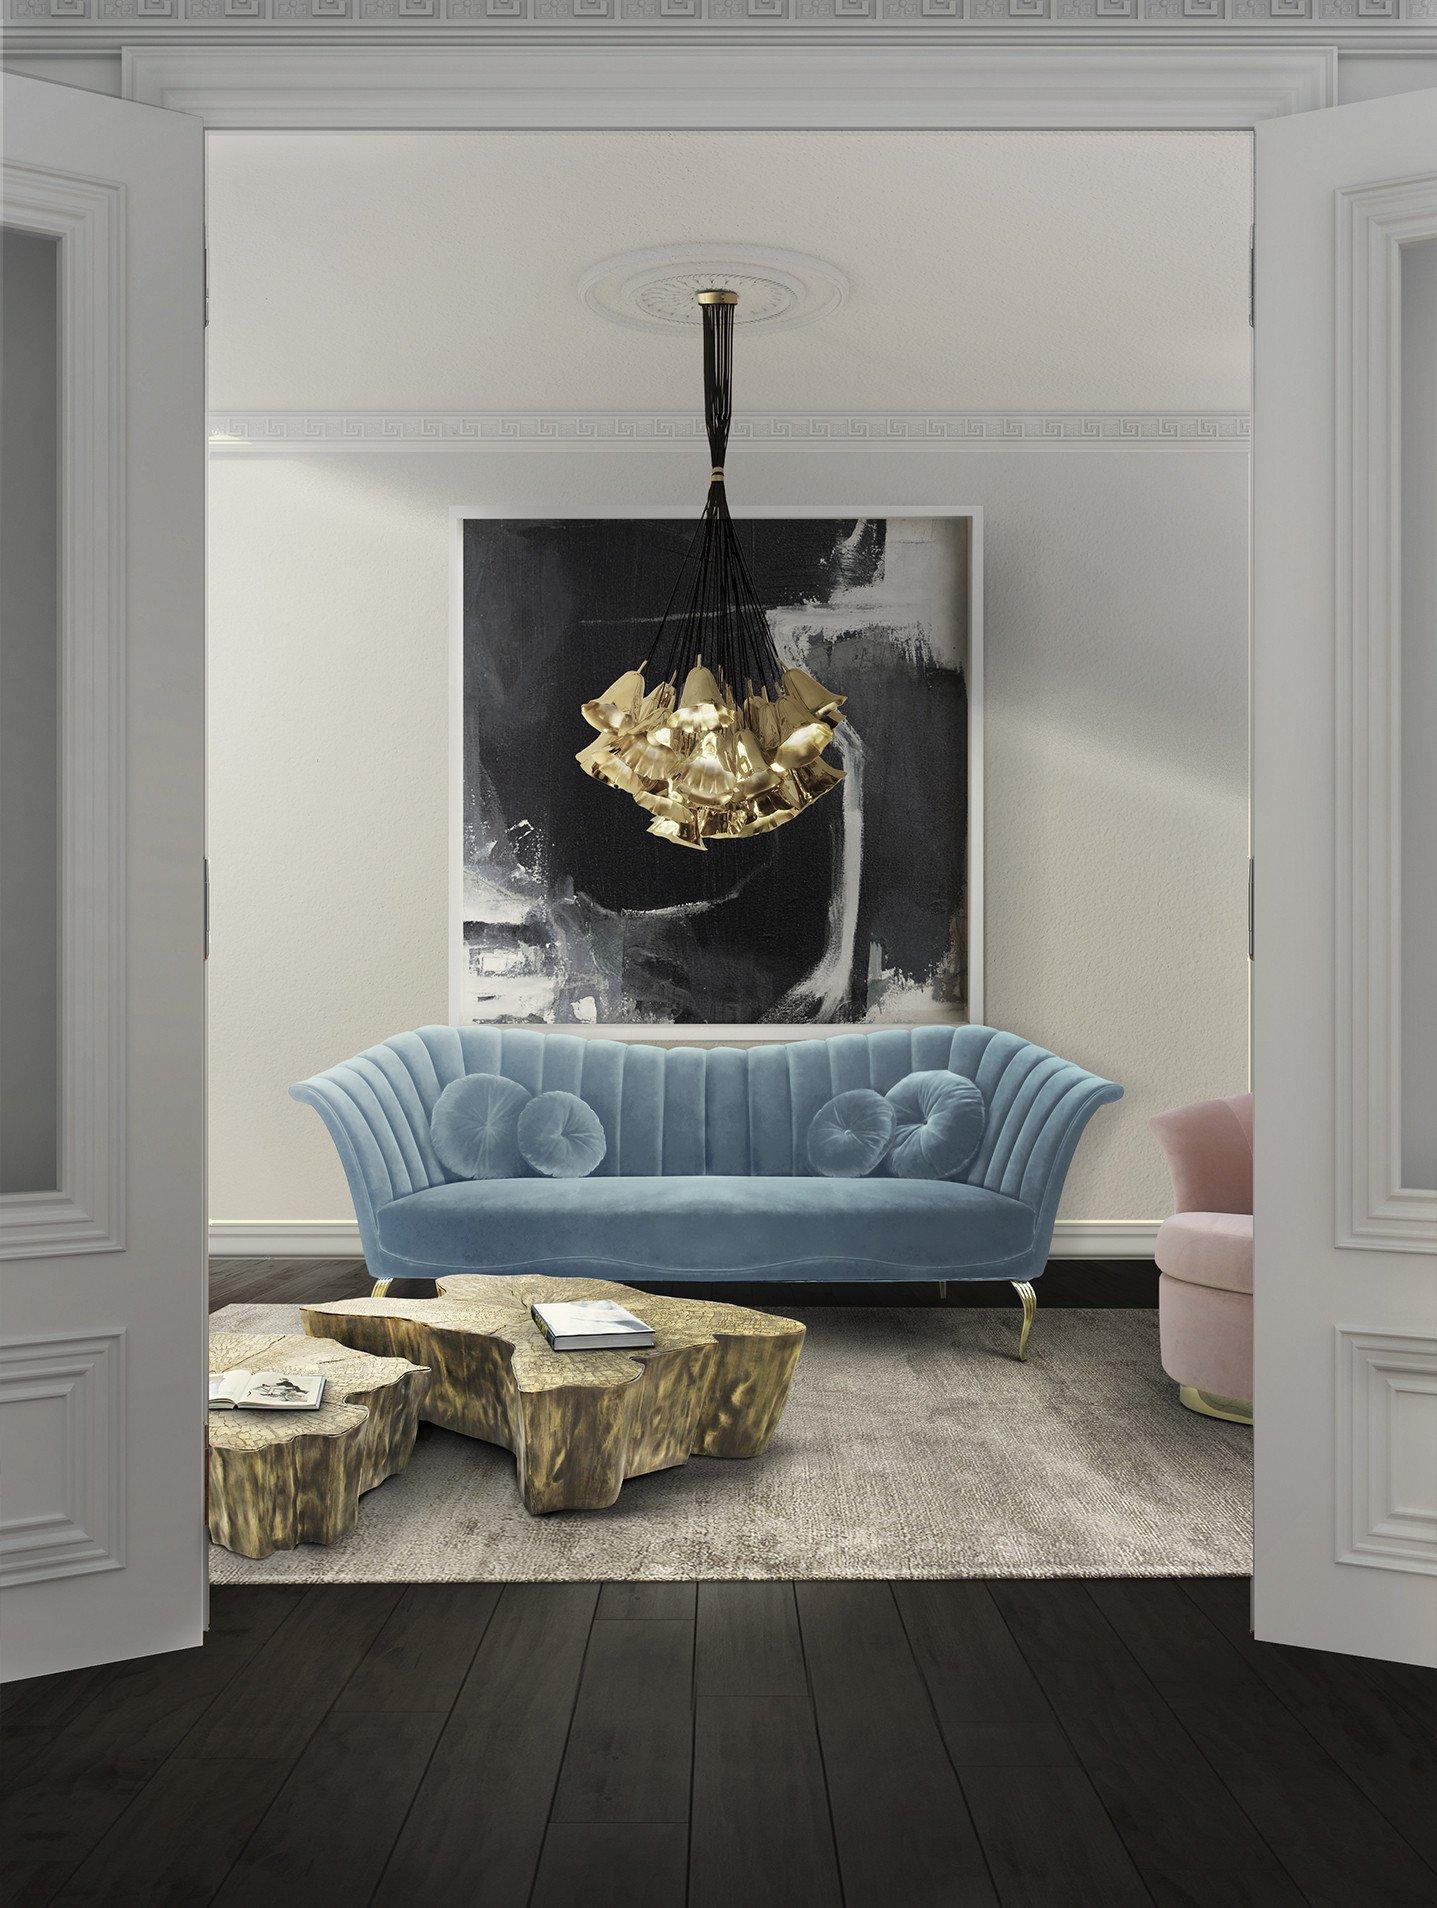 Full Bedroom Furniture Set Best Of 16 Spectacular Gray Hardwood Floors Bedroom